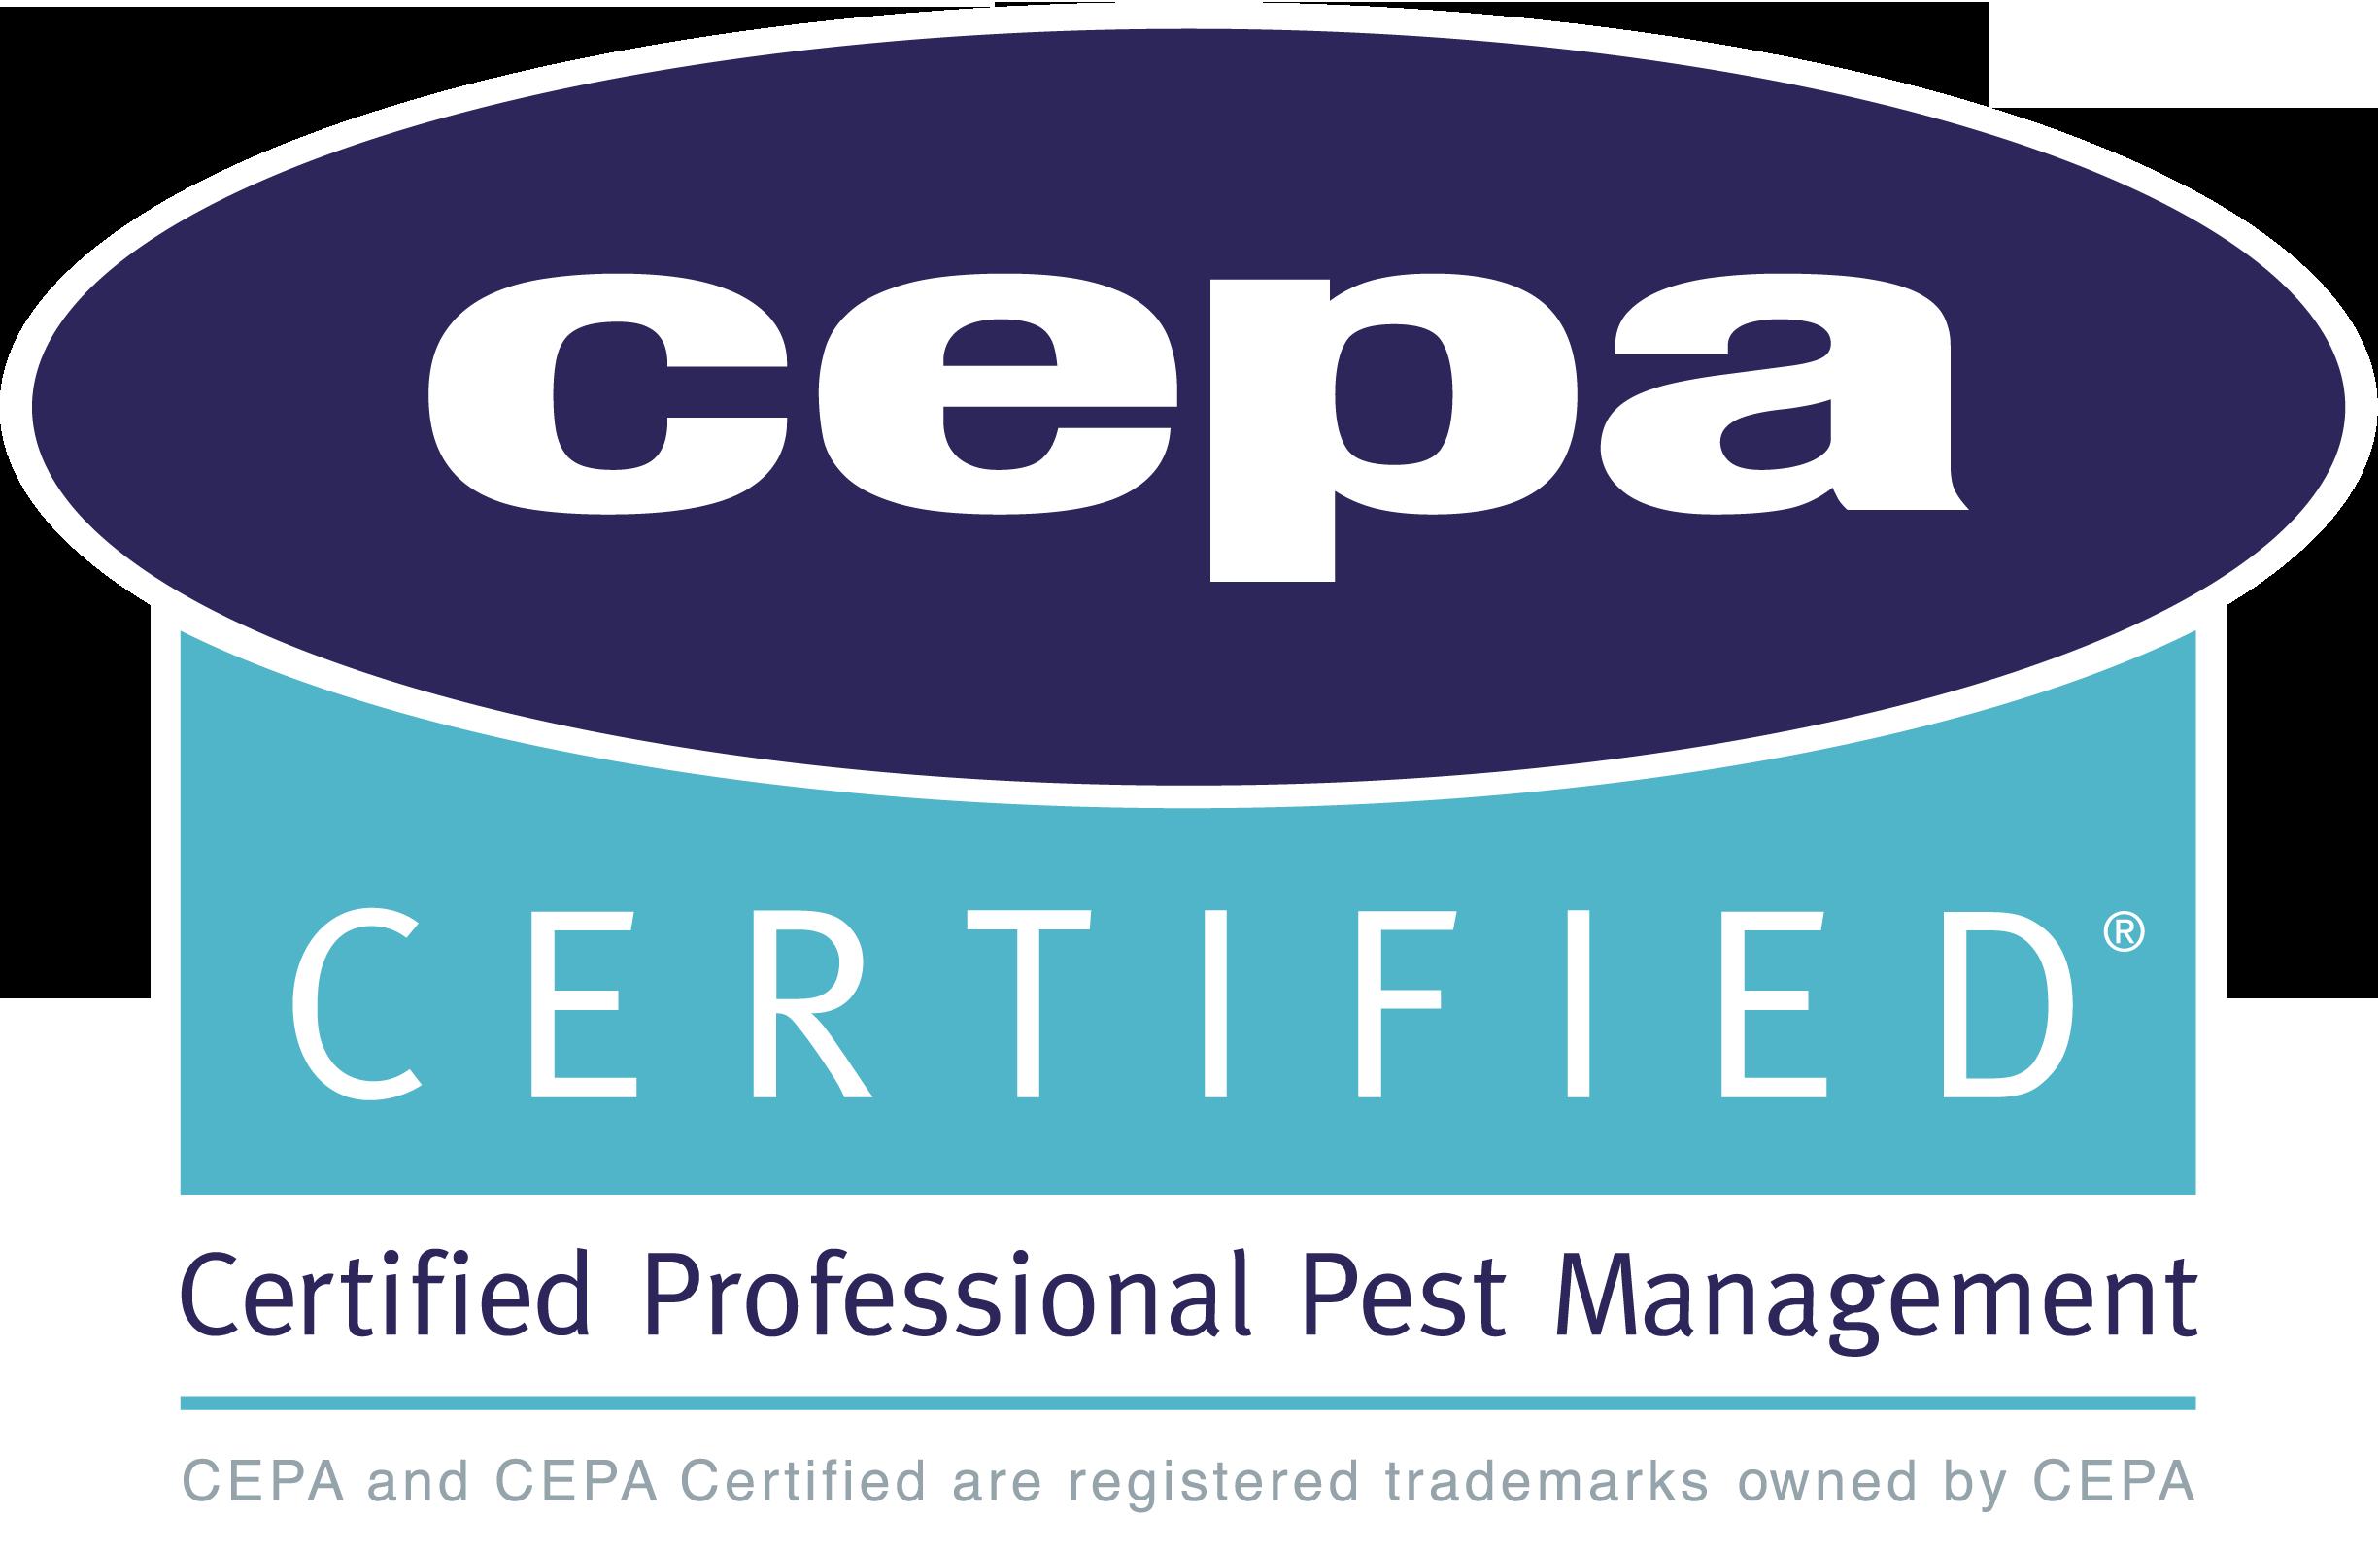 Entreprise certifiée CEPA